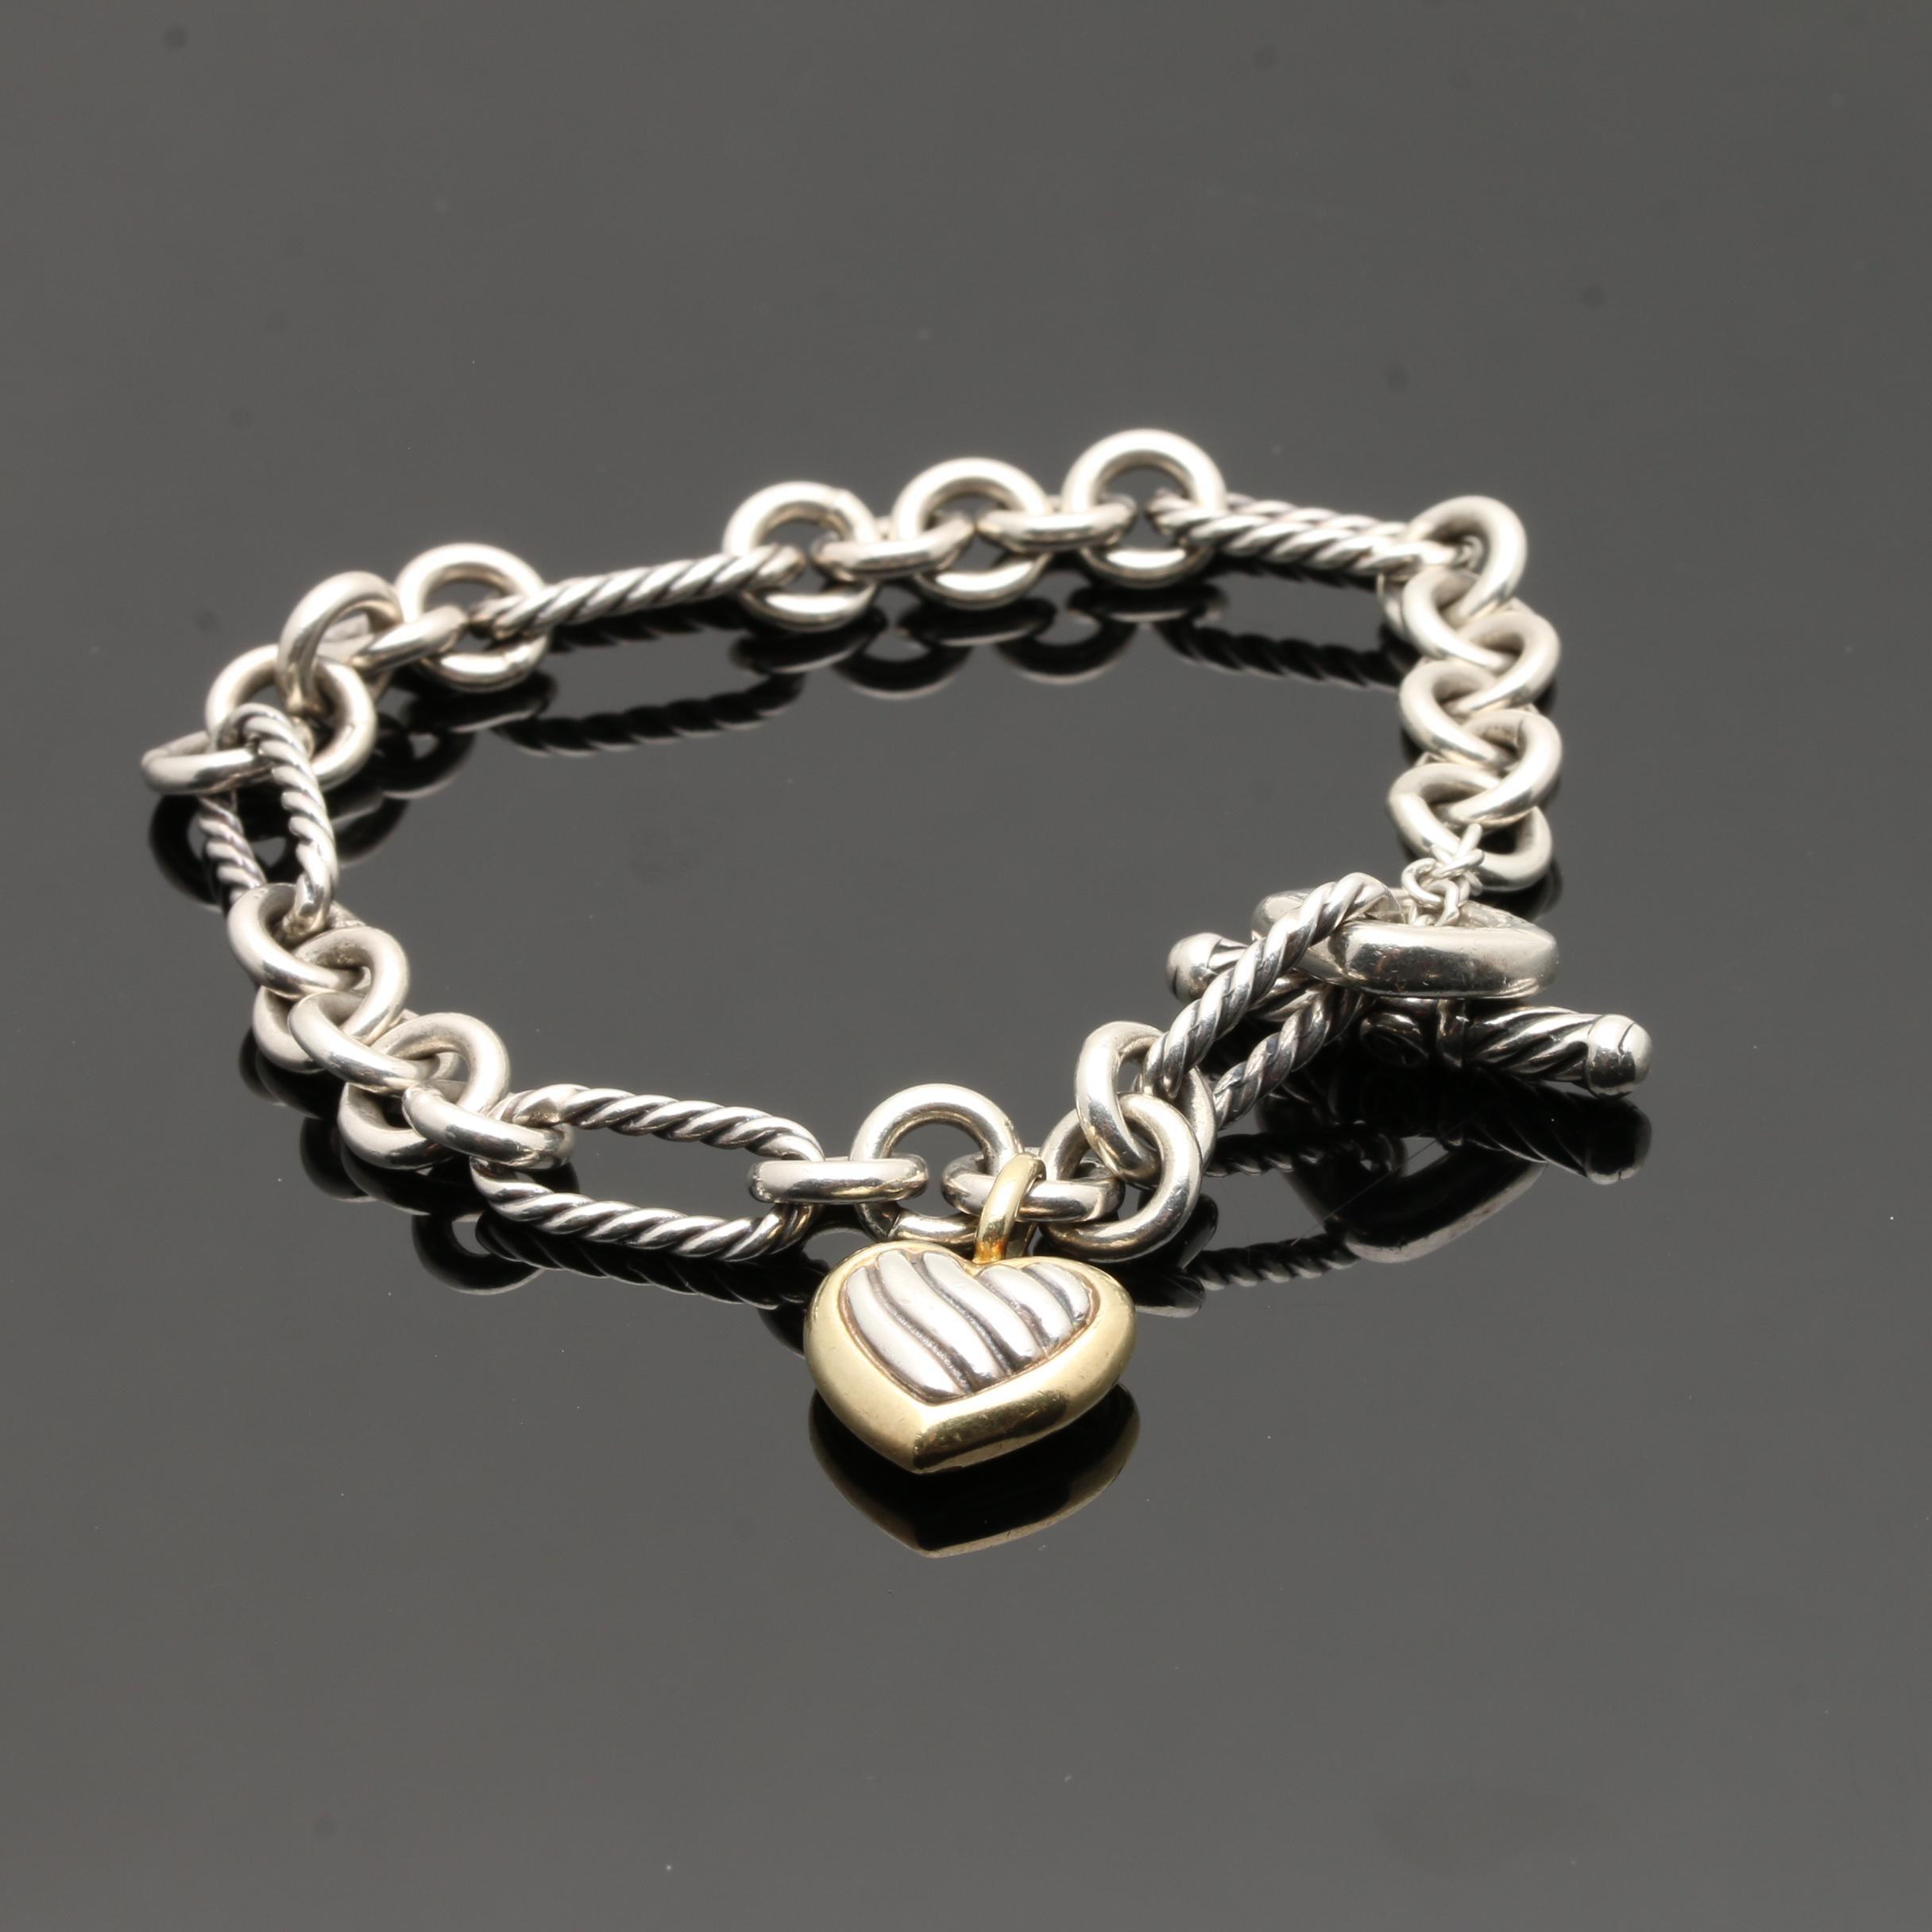 David Yurman Sterling Silver and 18K Yellow Gold Charm Bracelet